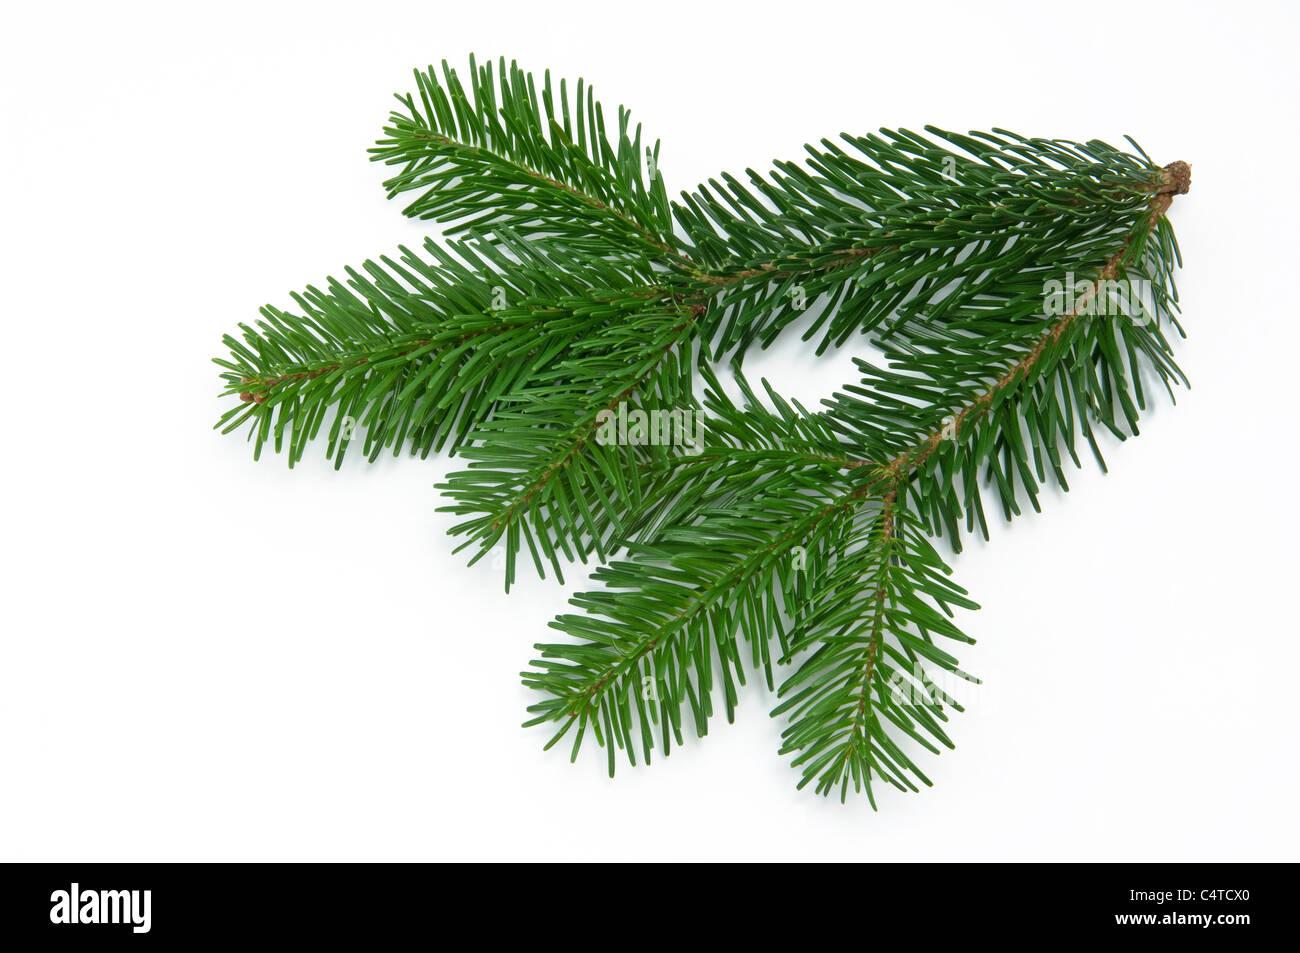 Caucasian Fir, Nordmann Fir (Abies nordmanniana), twig. Studio picture against a white background. - Stock Image